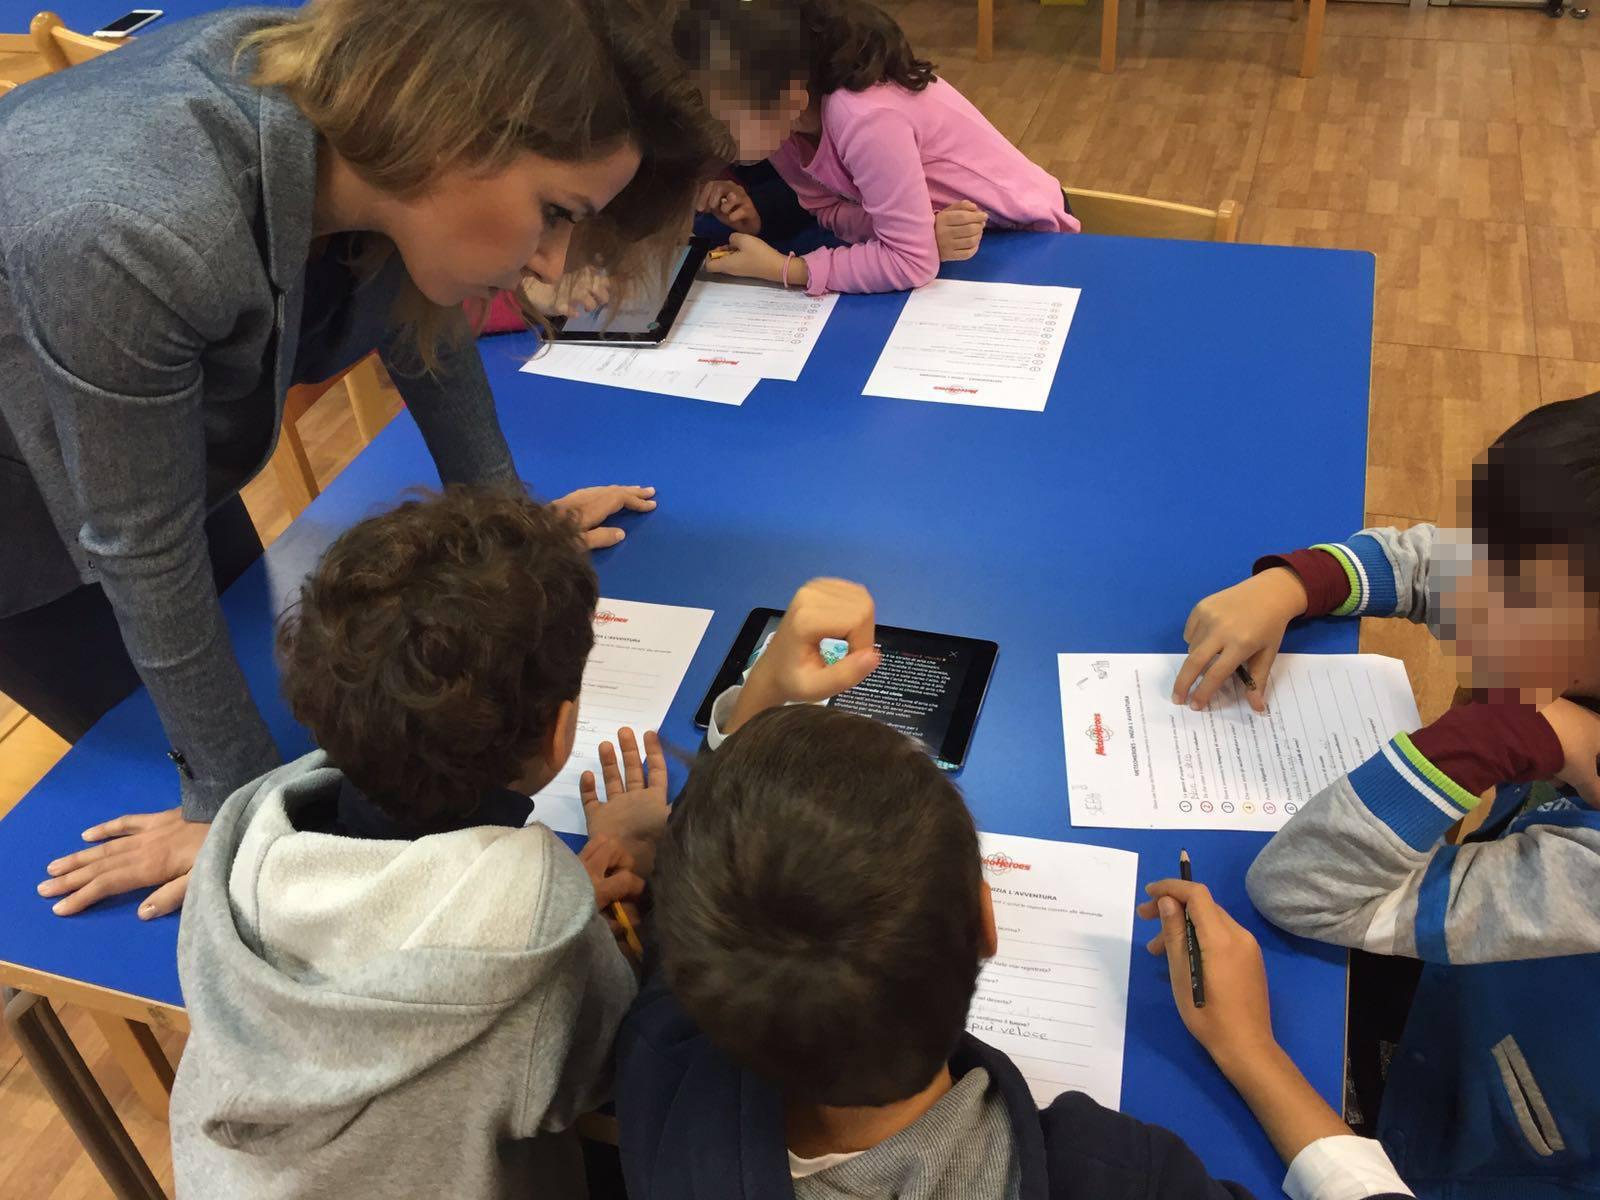 meteoheros rozzano digital readers 2016